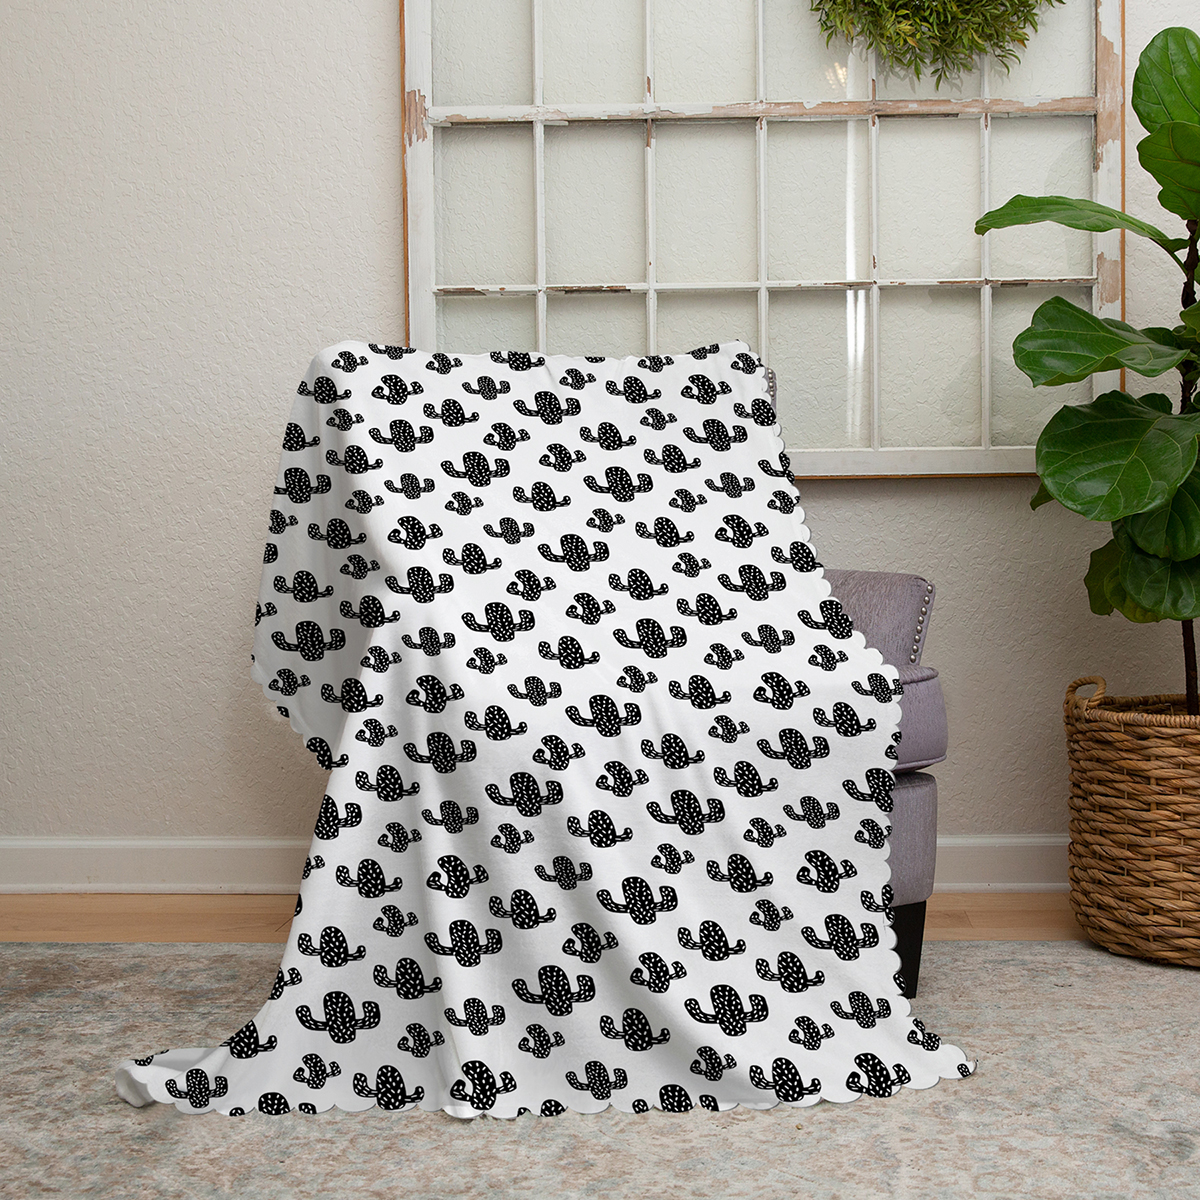 Realhomes Siyah Beyaz Kaktüs Desenli Modern Şönil Koltuk Örtüsü Realhomes